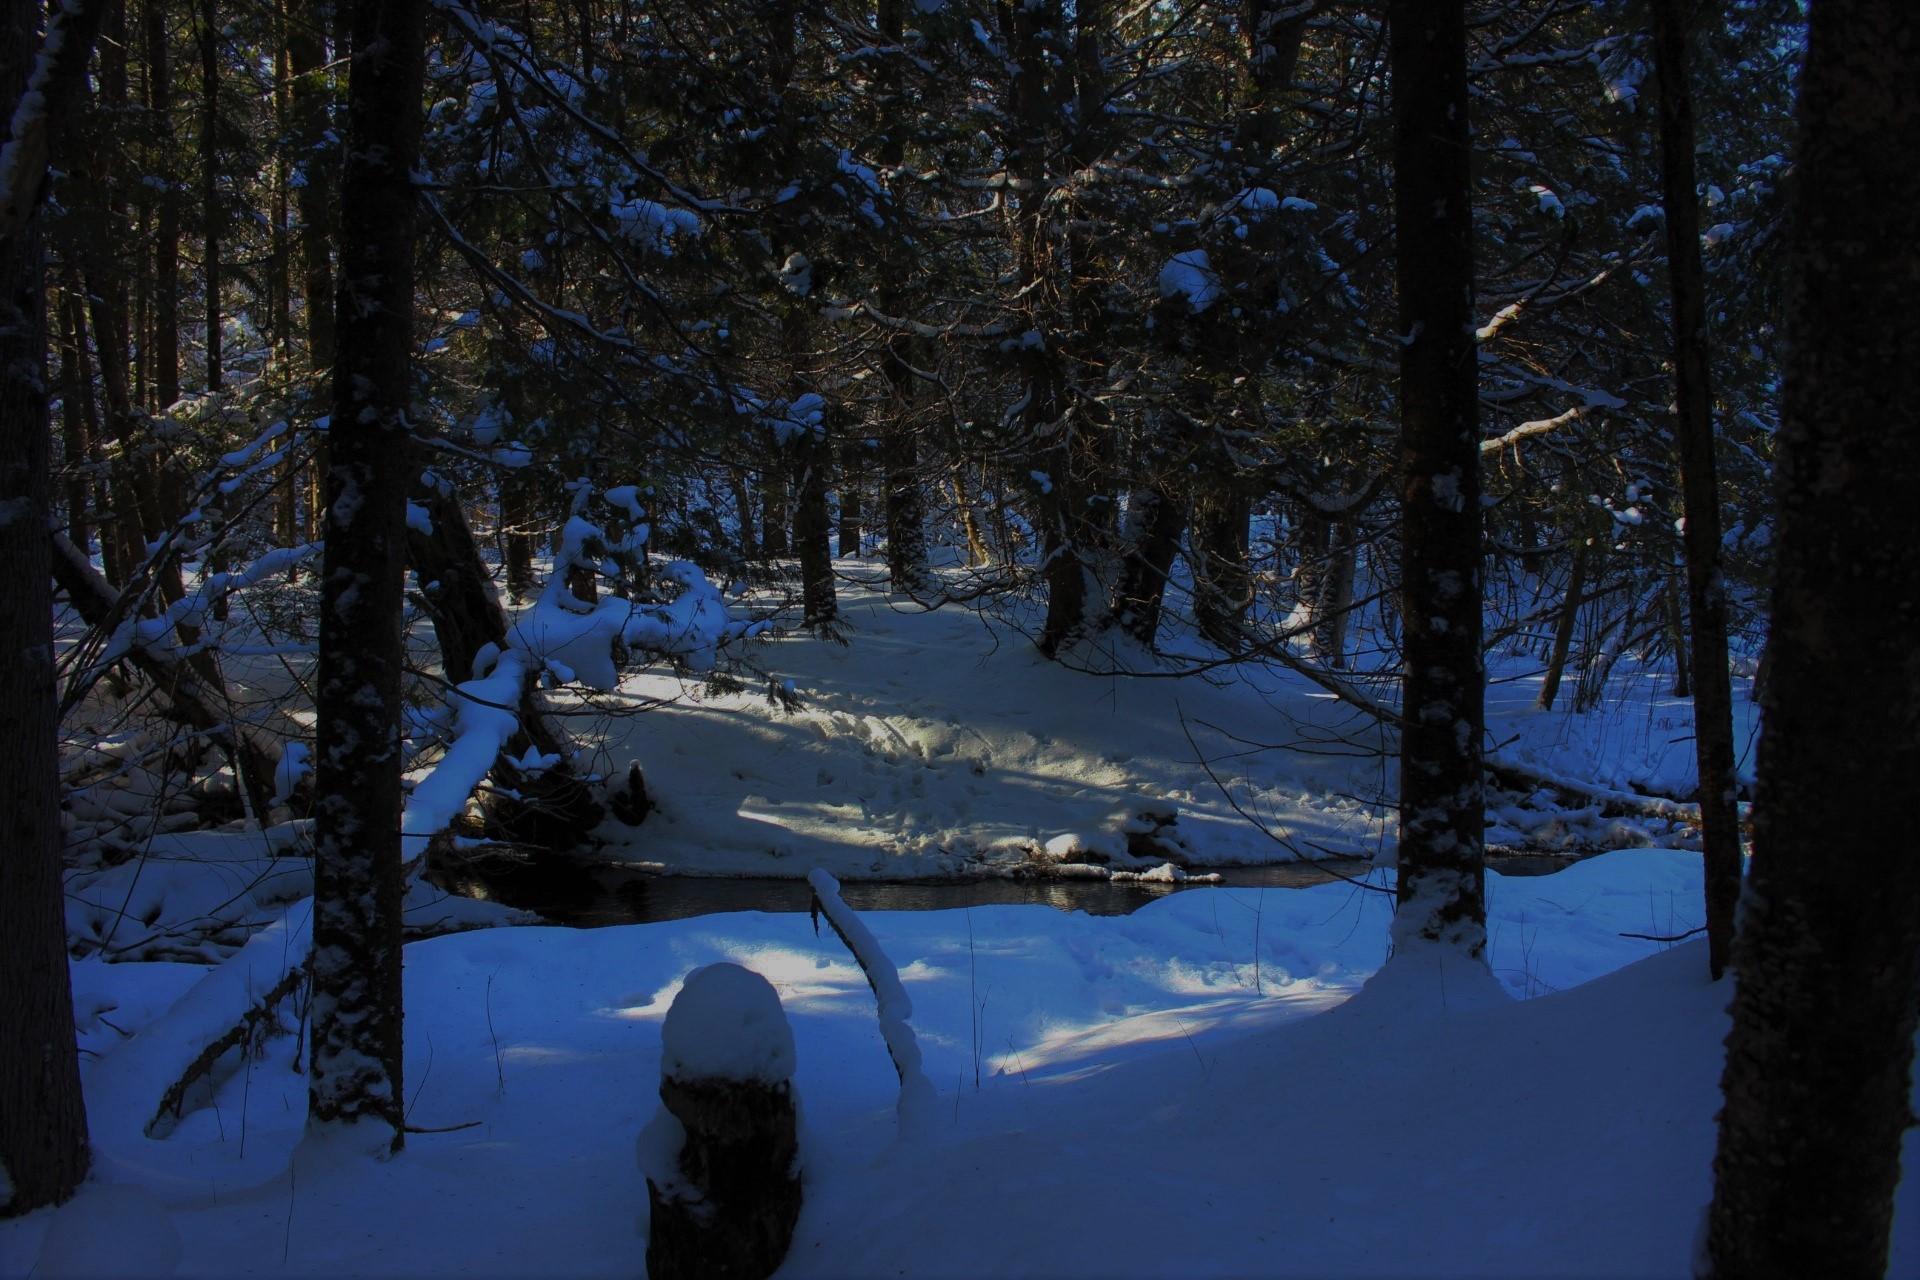 Snowy Trails Dark - MARSH BY MOONLIGHT SNOWSHOE